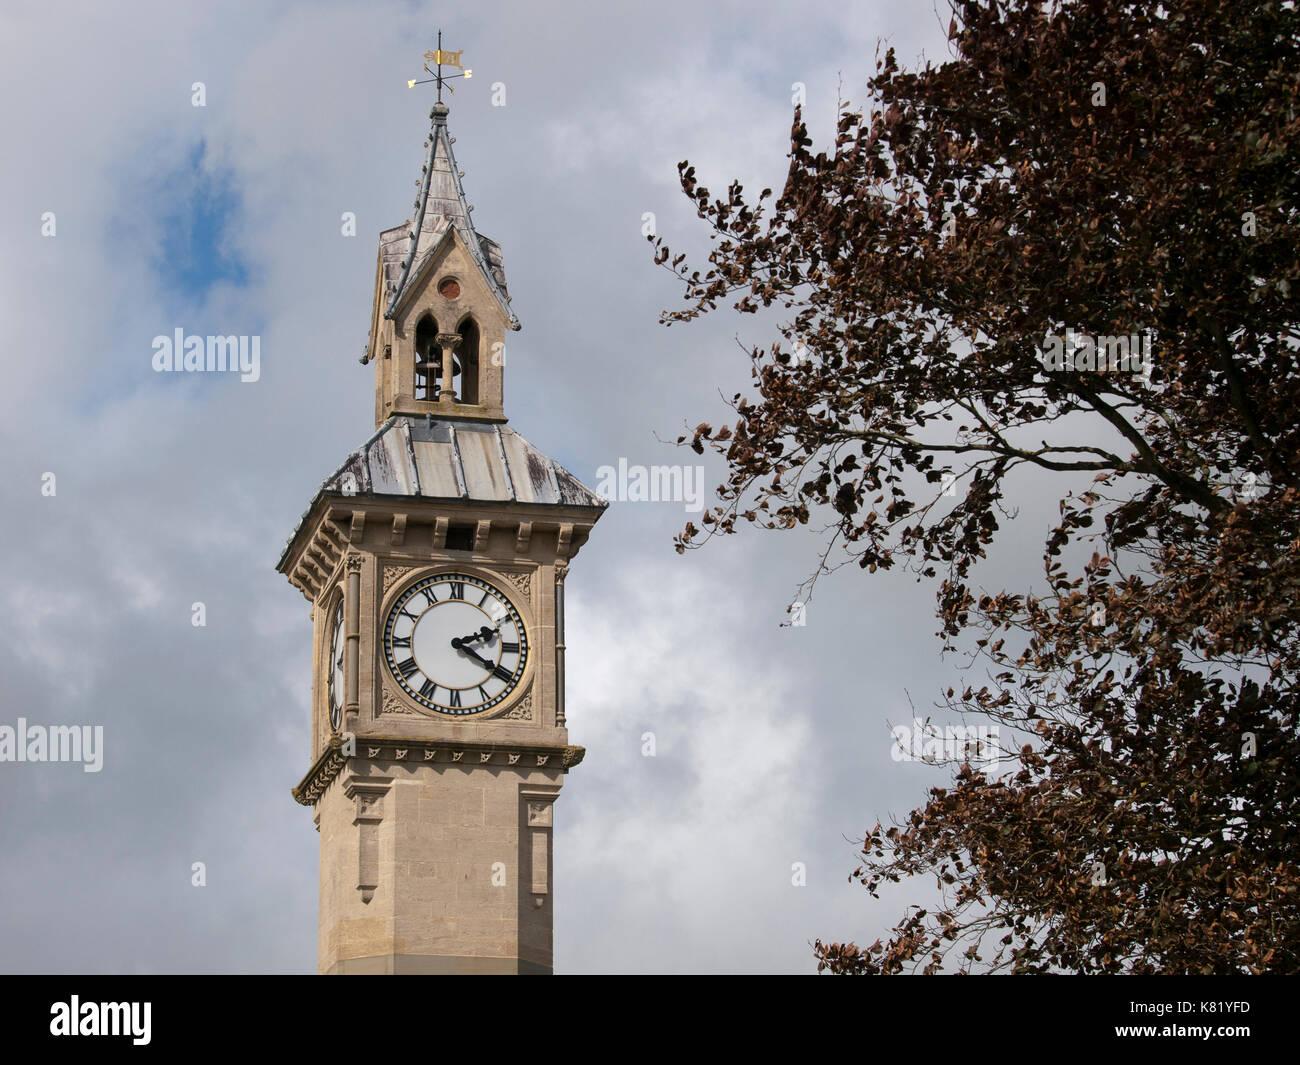 Prince Albert Memorial Clock in Barnstaple, Devon, UK - Stock Image